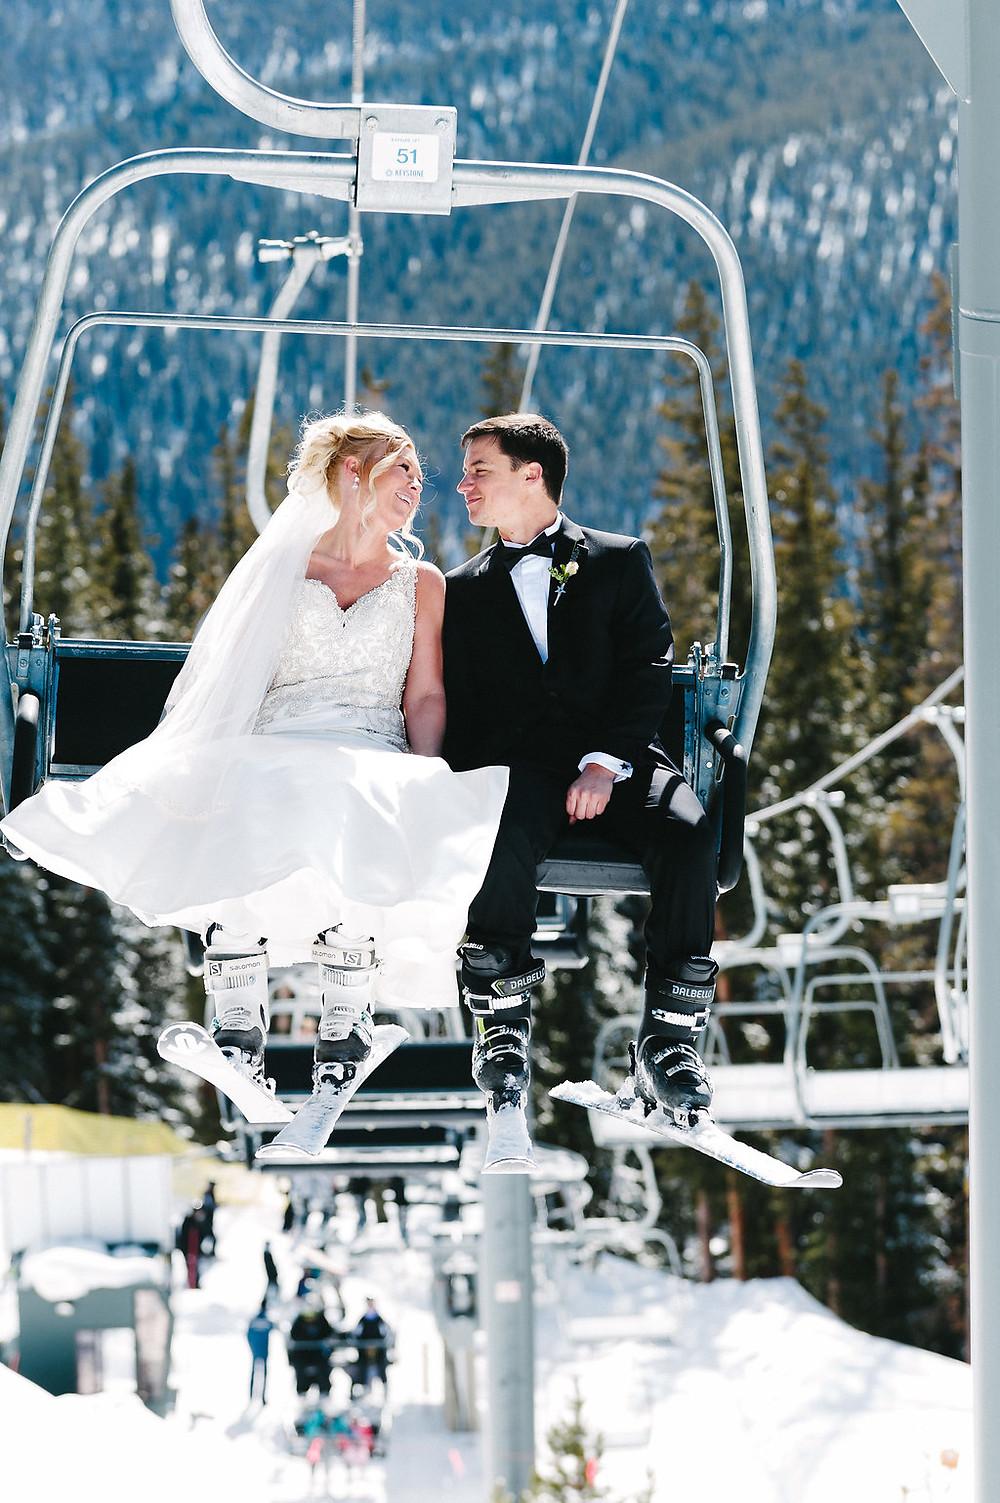 Colorado Winter Wedding - Colorado Winter Wedding Couple Ski Lift